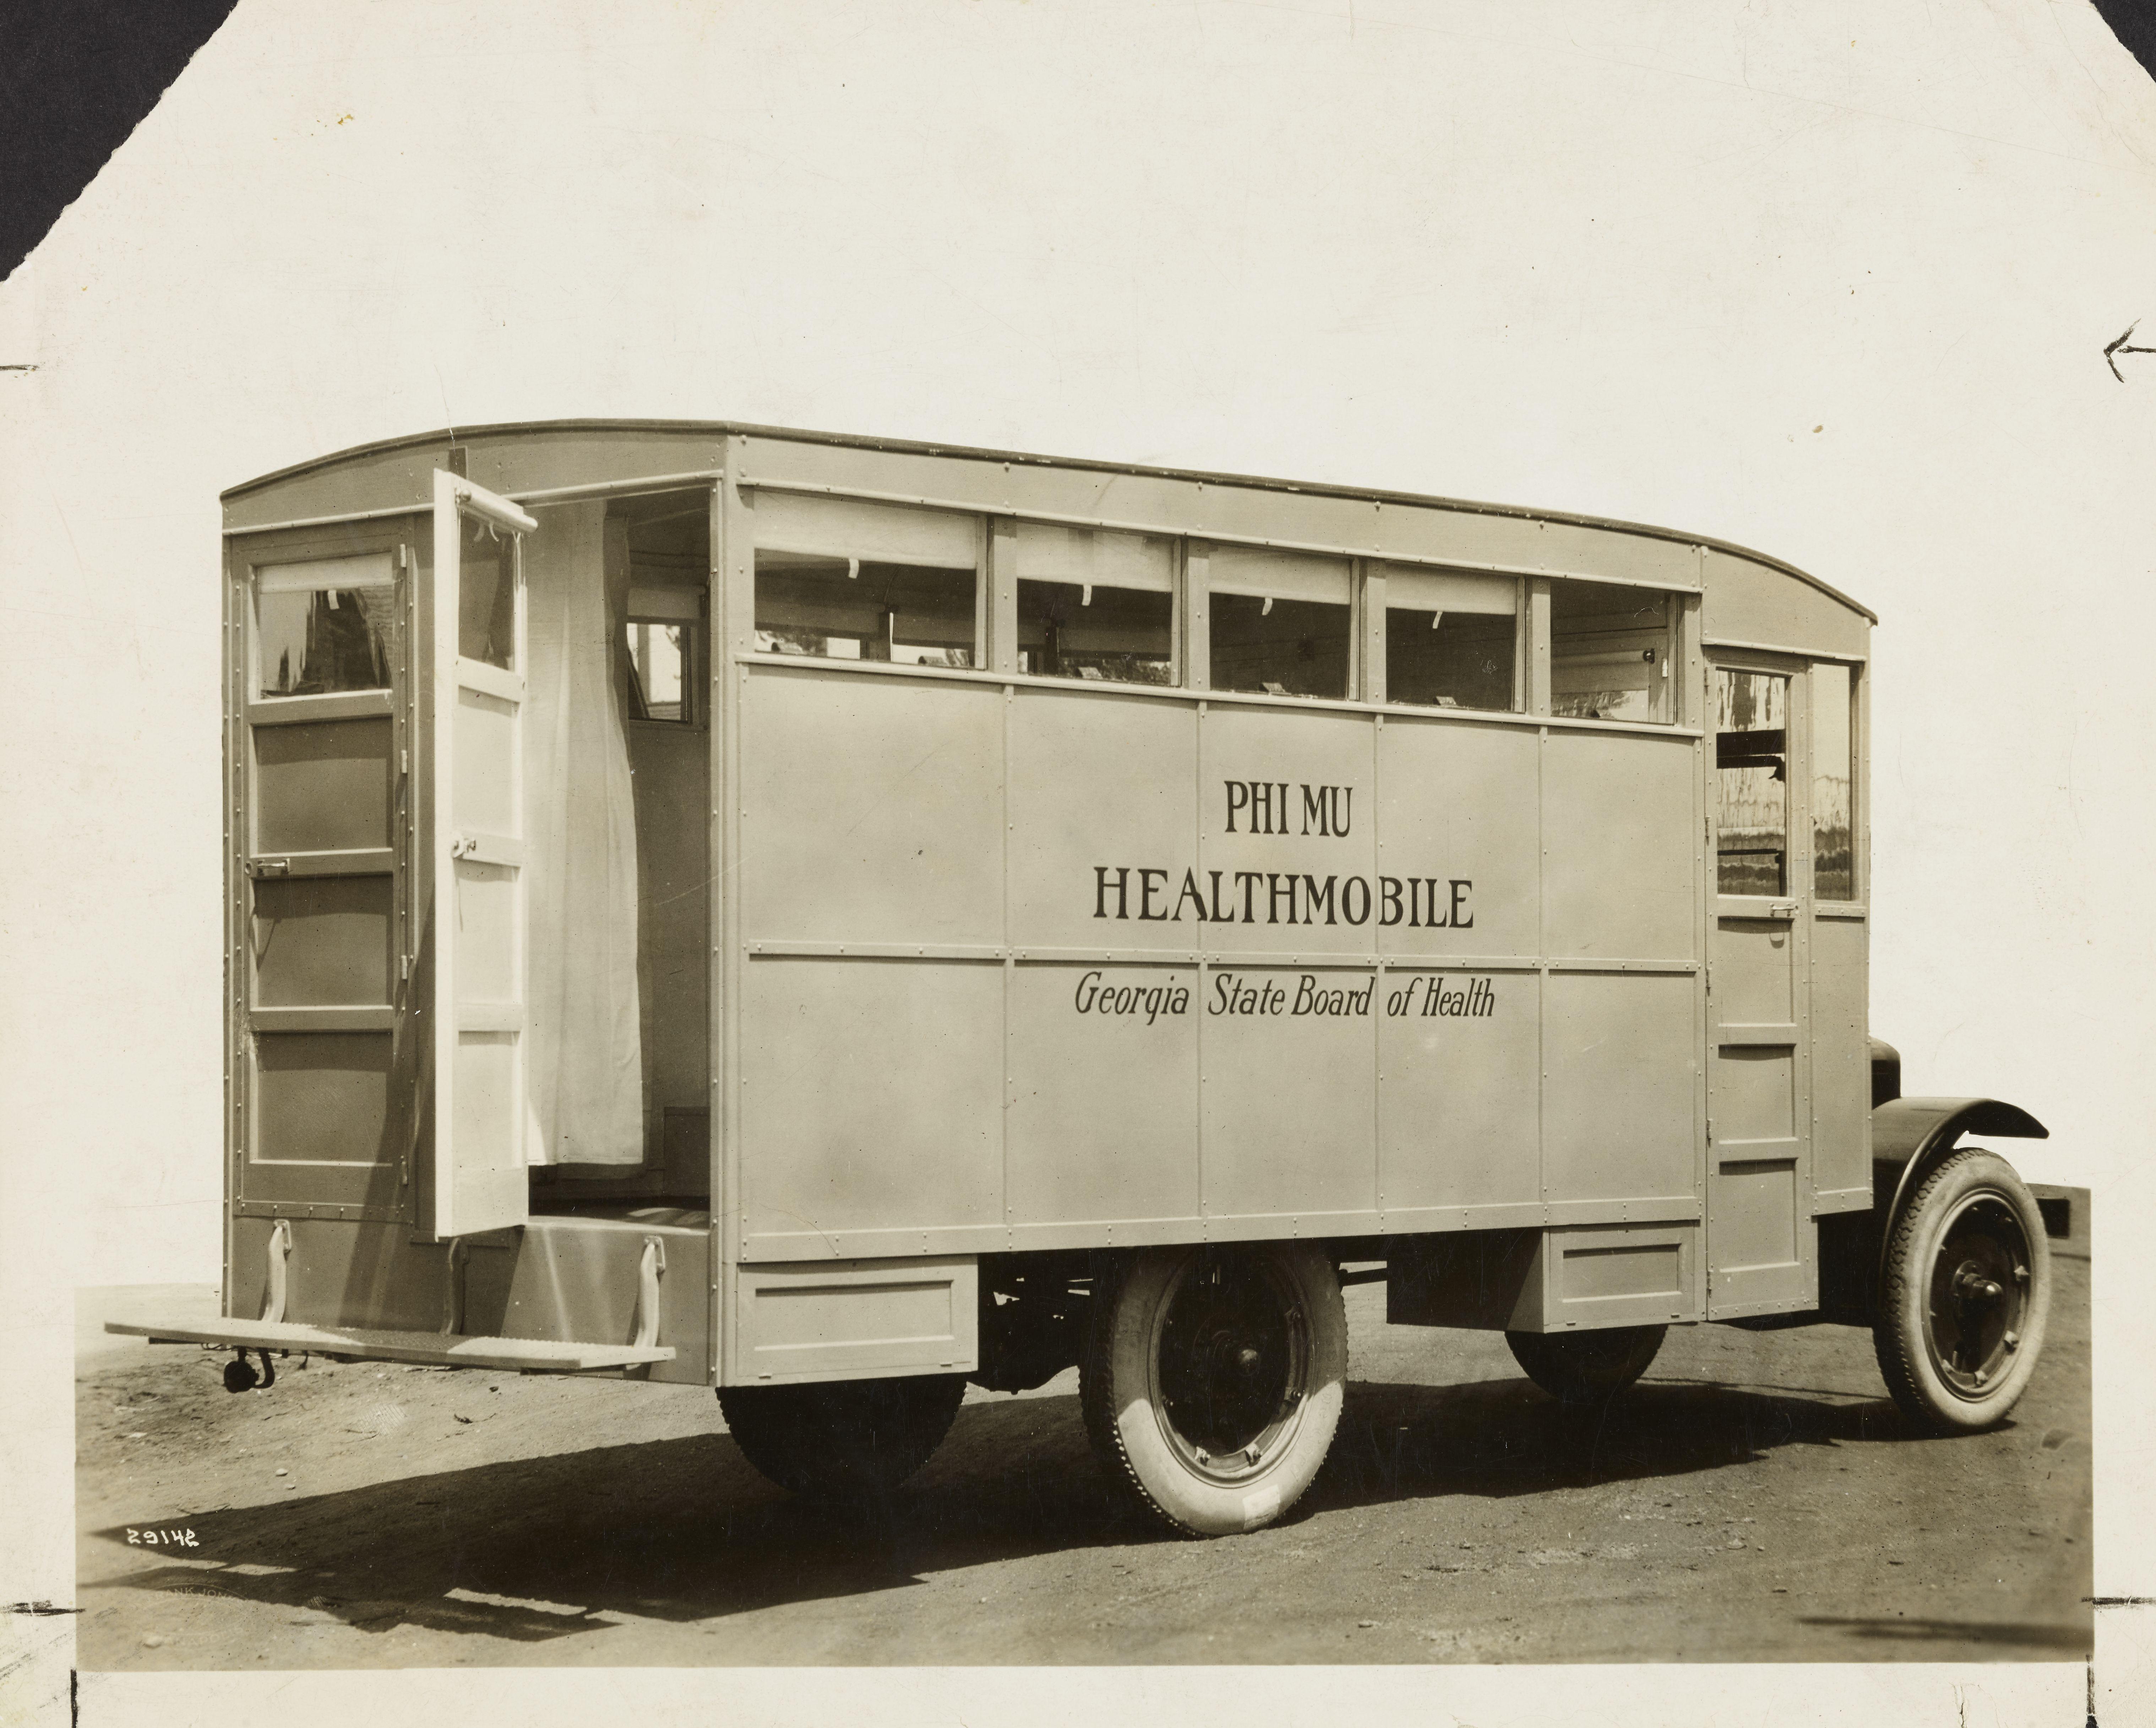 Phi Mu Healthmobile Introduced, 1921 Image